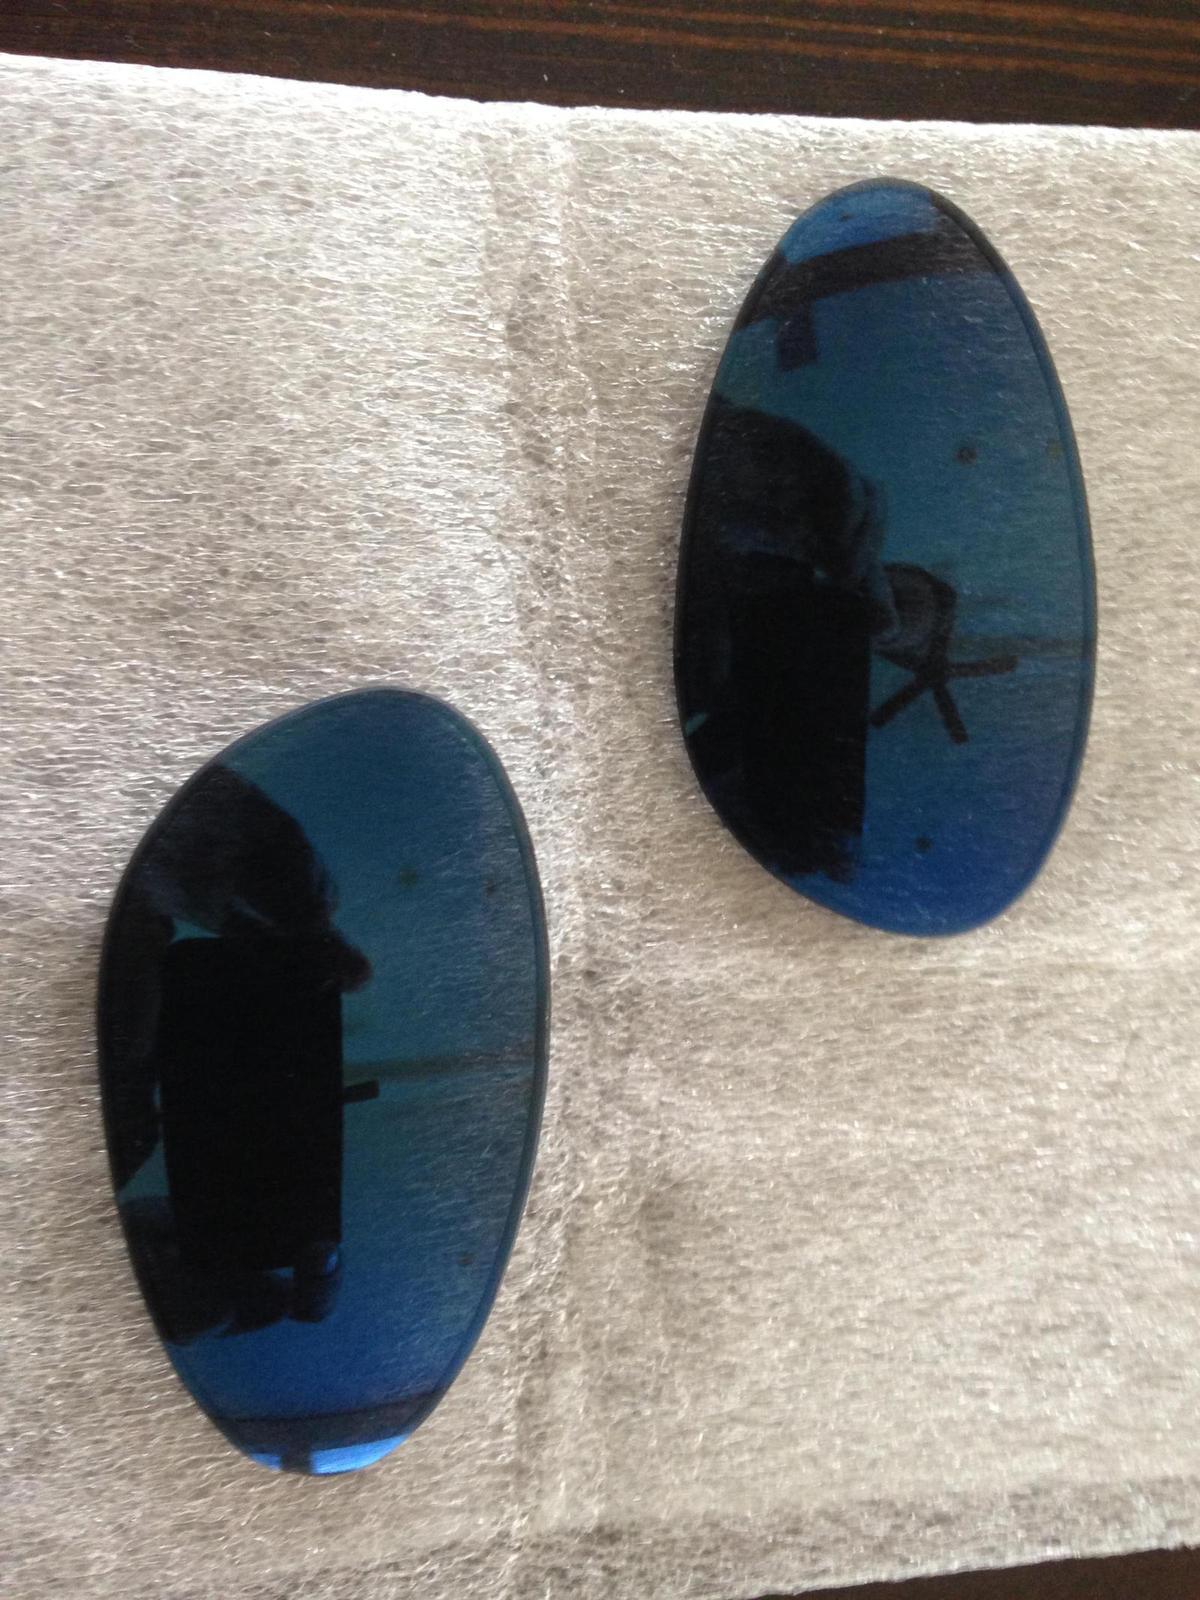 Penny Titanium w/ VR28 and Ice Iridium + bonus $350 - 4djPpPY.jpg